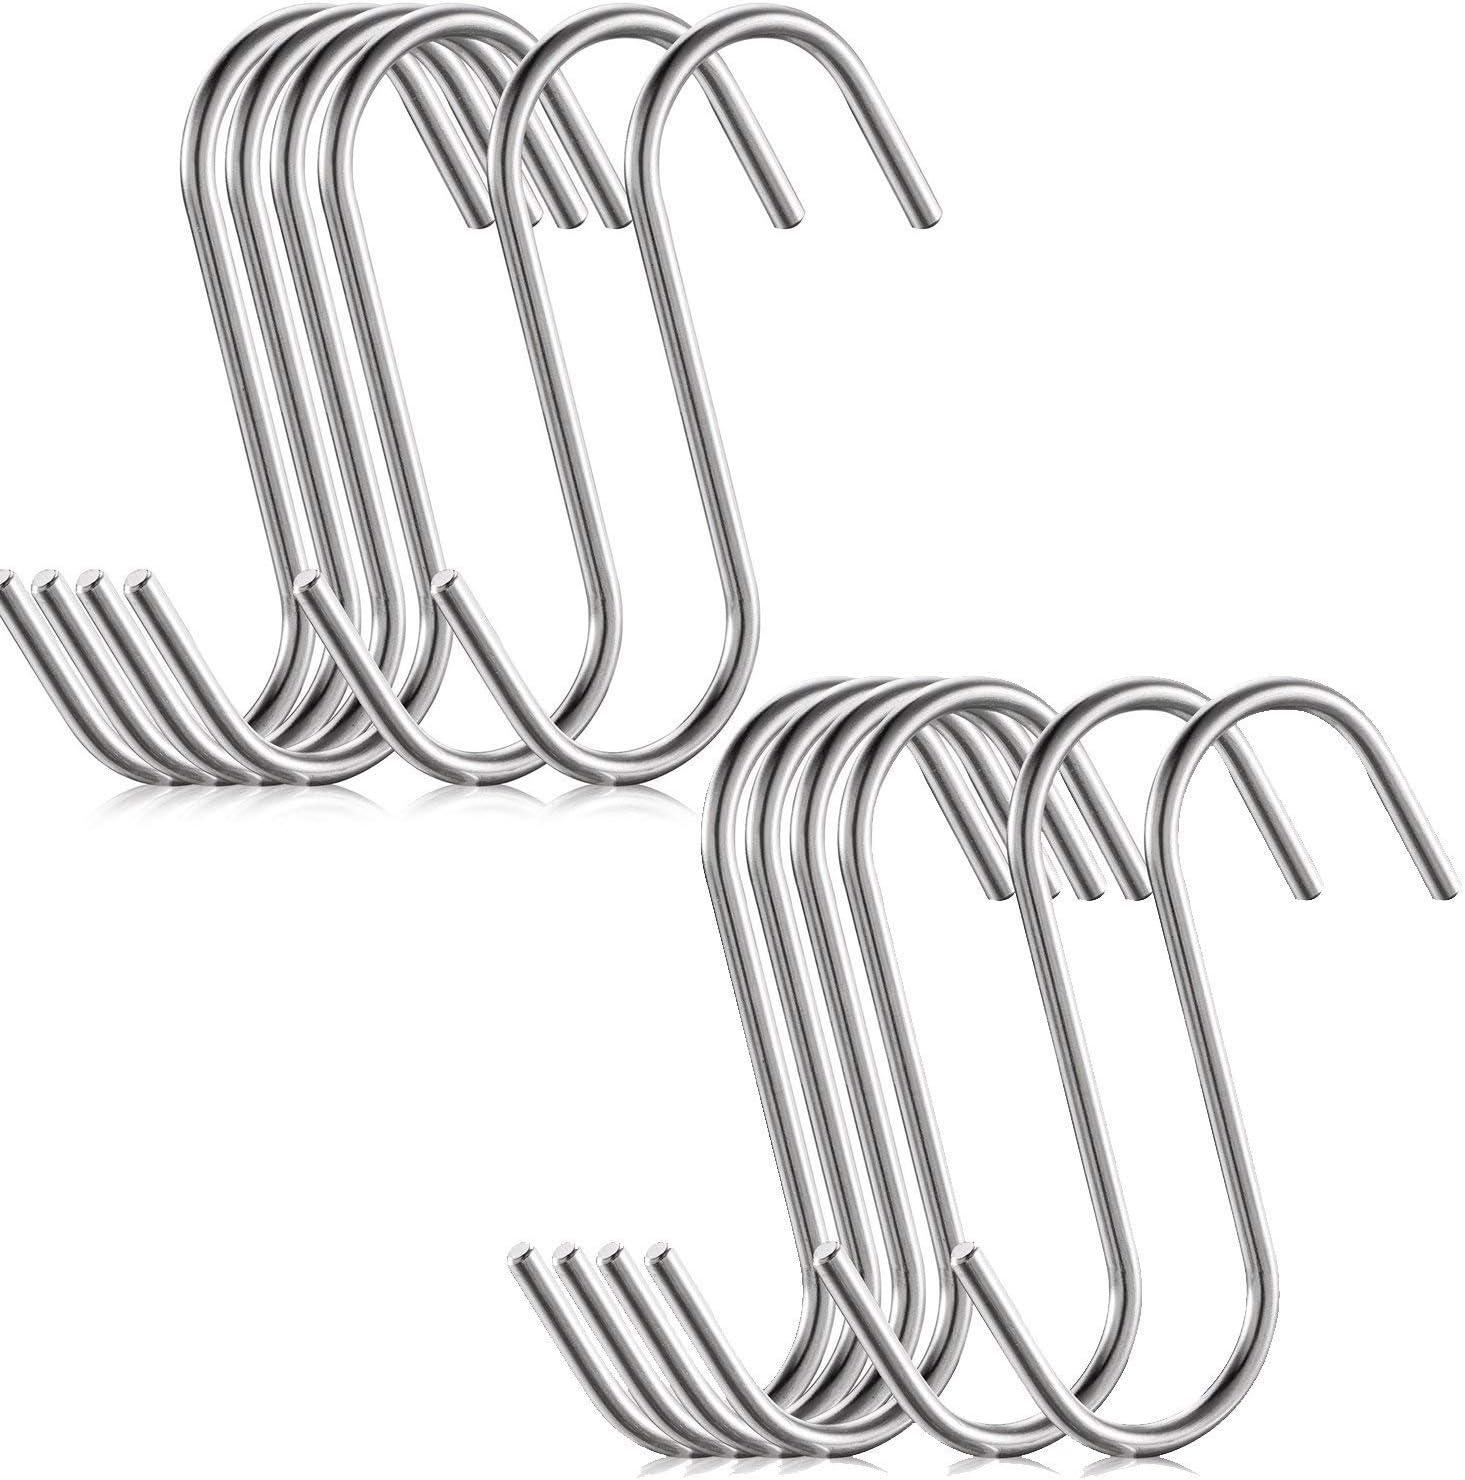 Llavero Cepillo de recogedor YING 10 Unidades Mini Ganchos en Forma de S para Colgar Ganchos cromados para joyer/ía